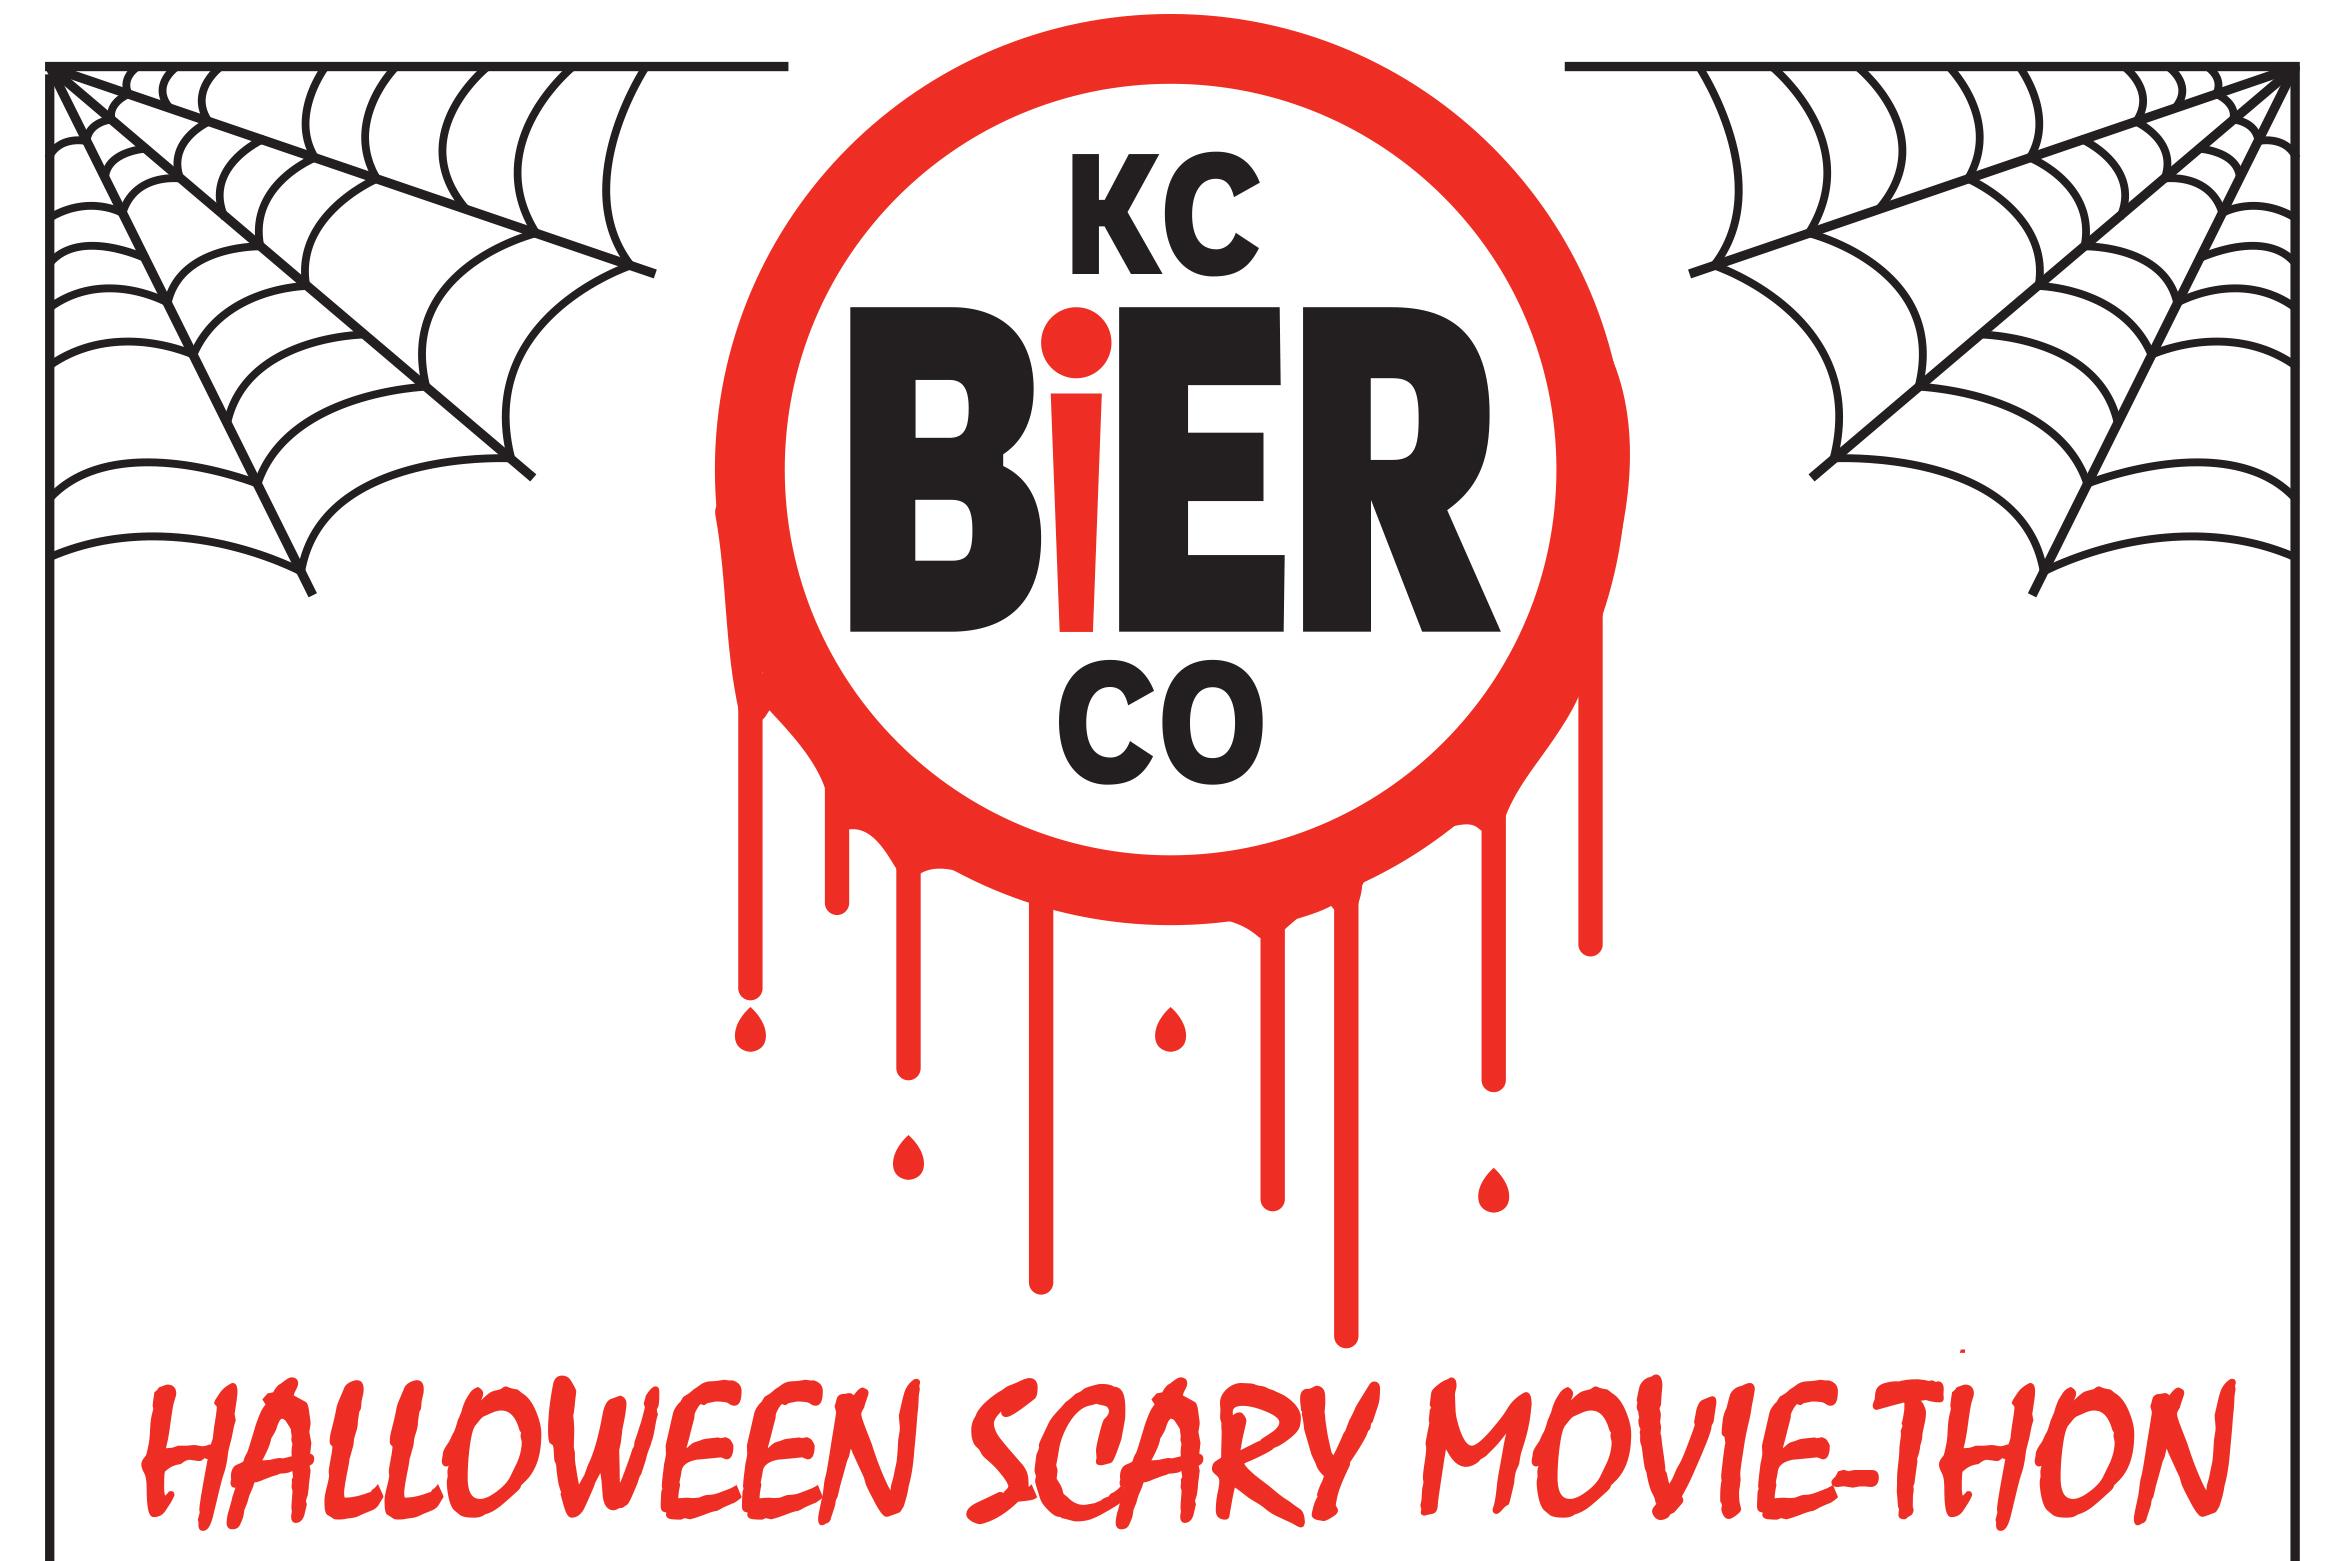 Halloween Bier.Halloween Scary Movie Thon Kc Bier Co German Style Beer